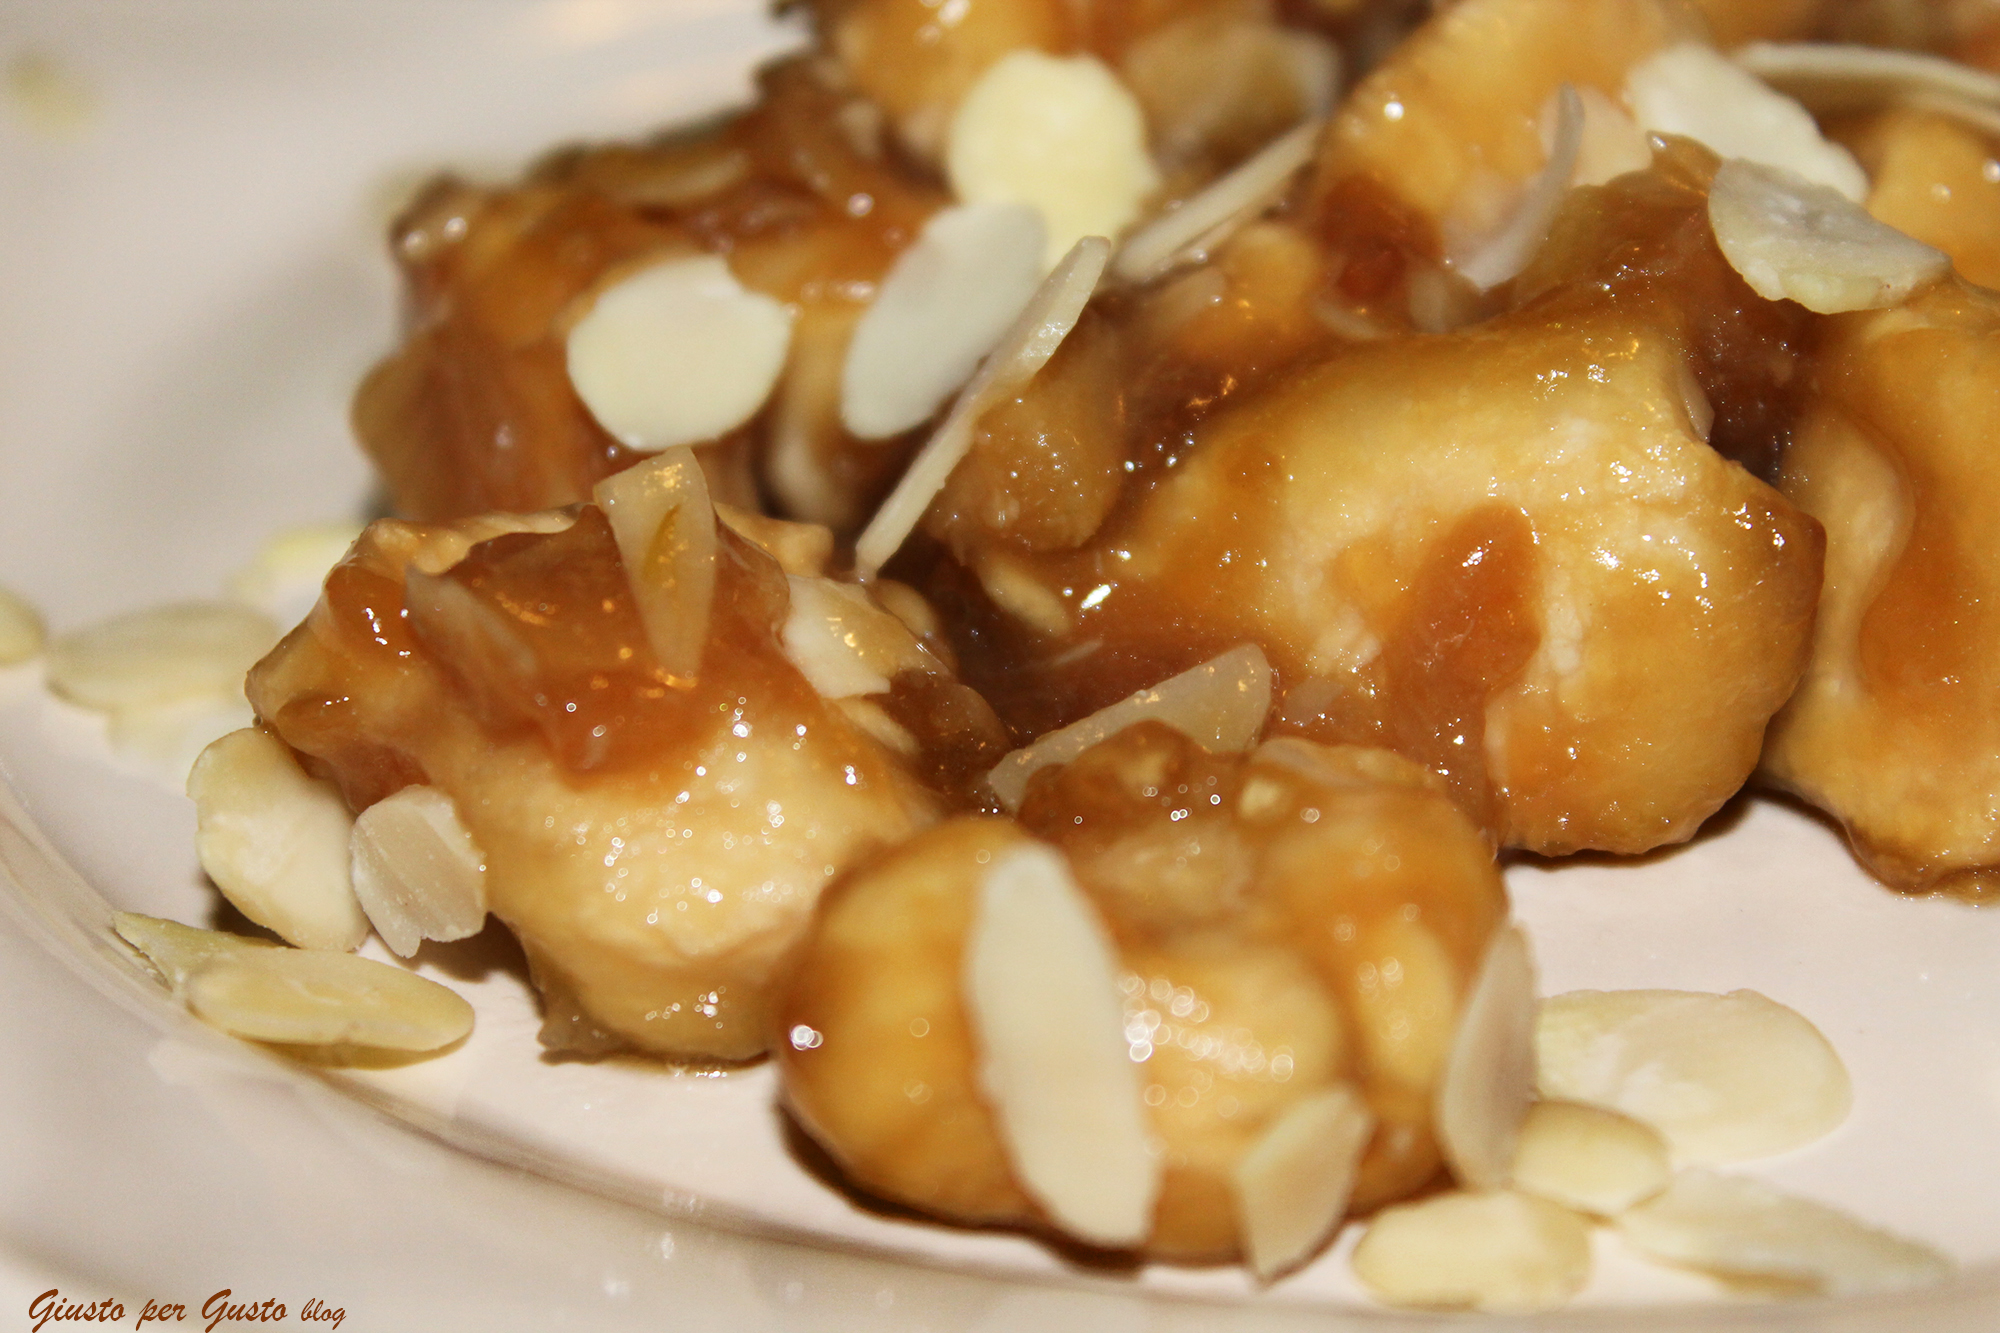 Cucina Cinese Homemade Pollo Alle Mandorle Giusto Per Il Gusto